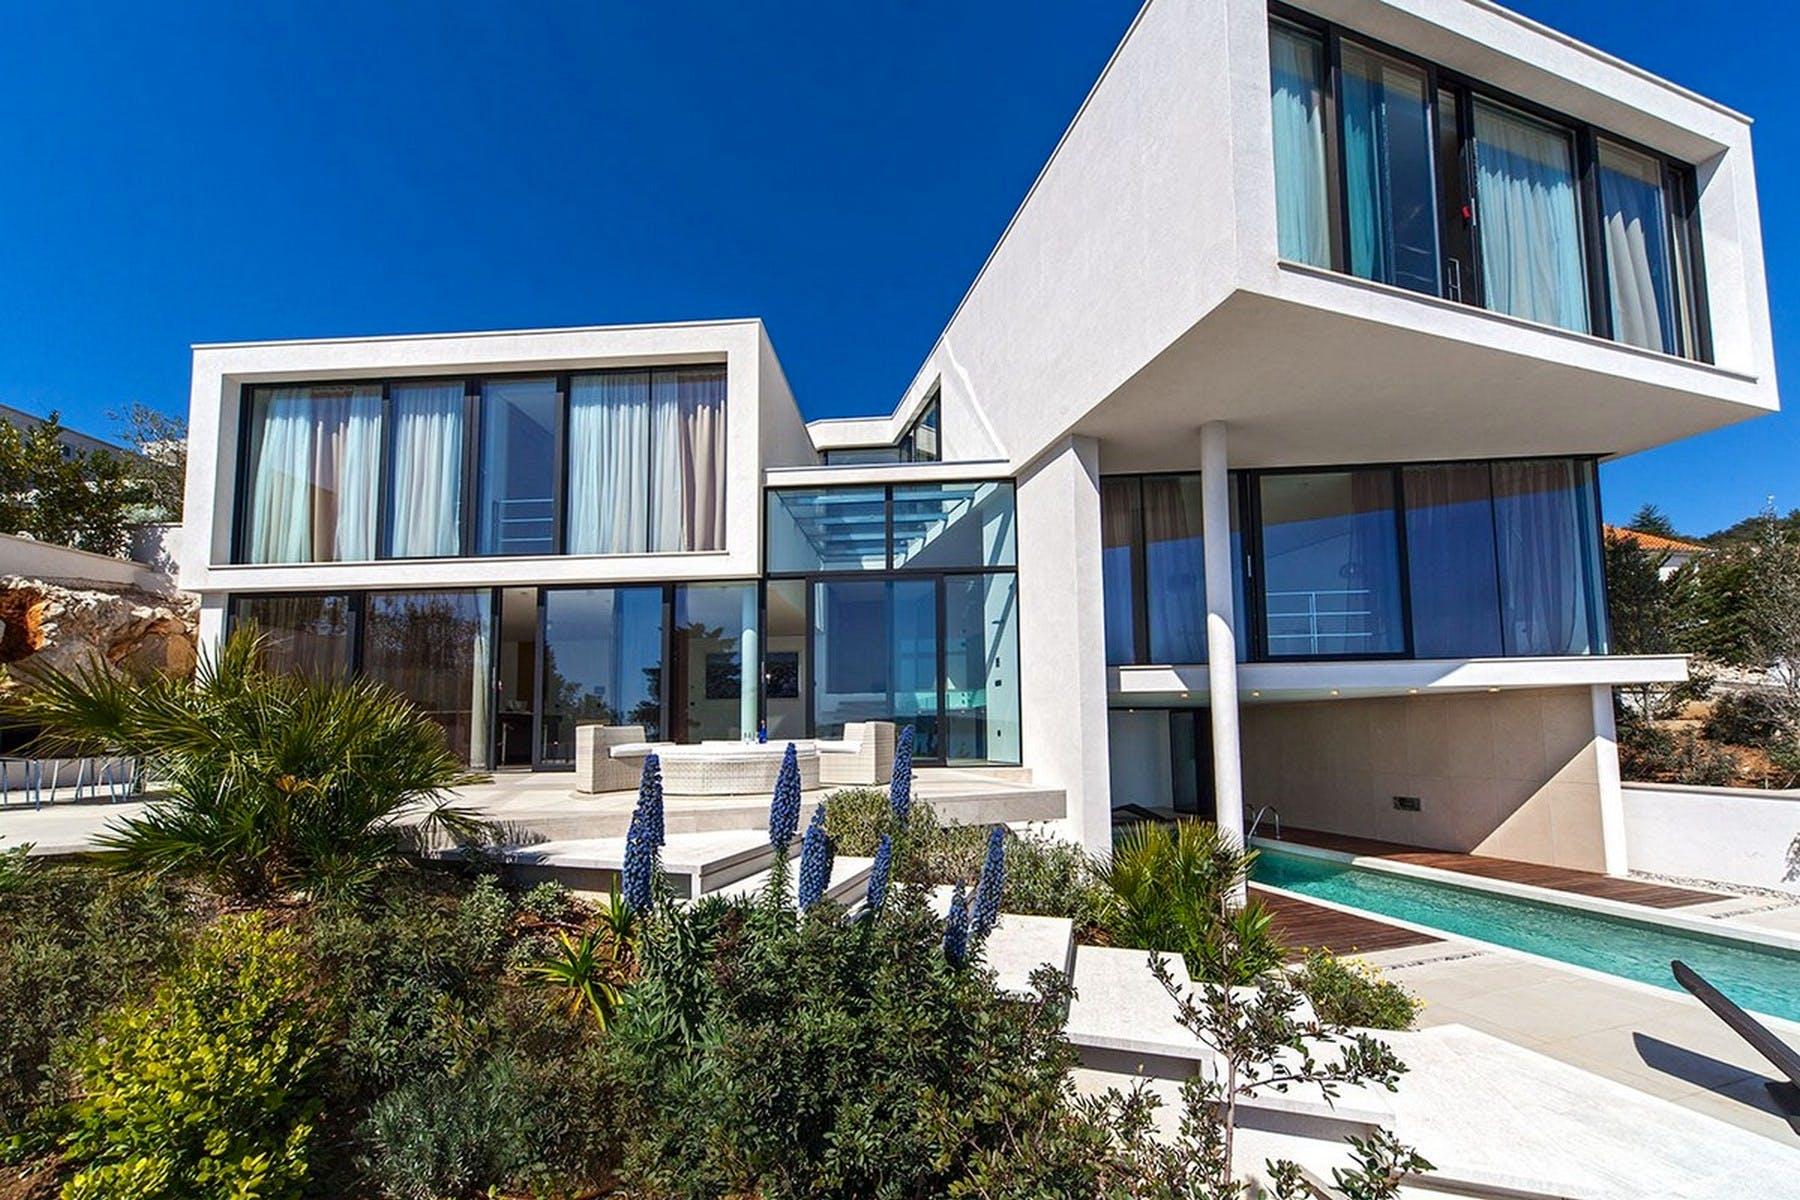 Modern villas in a resort for sale